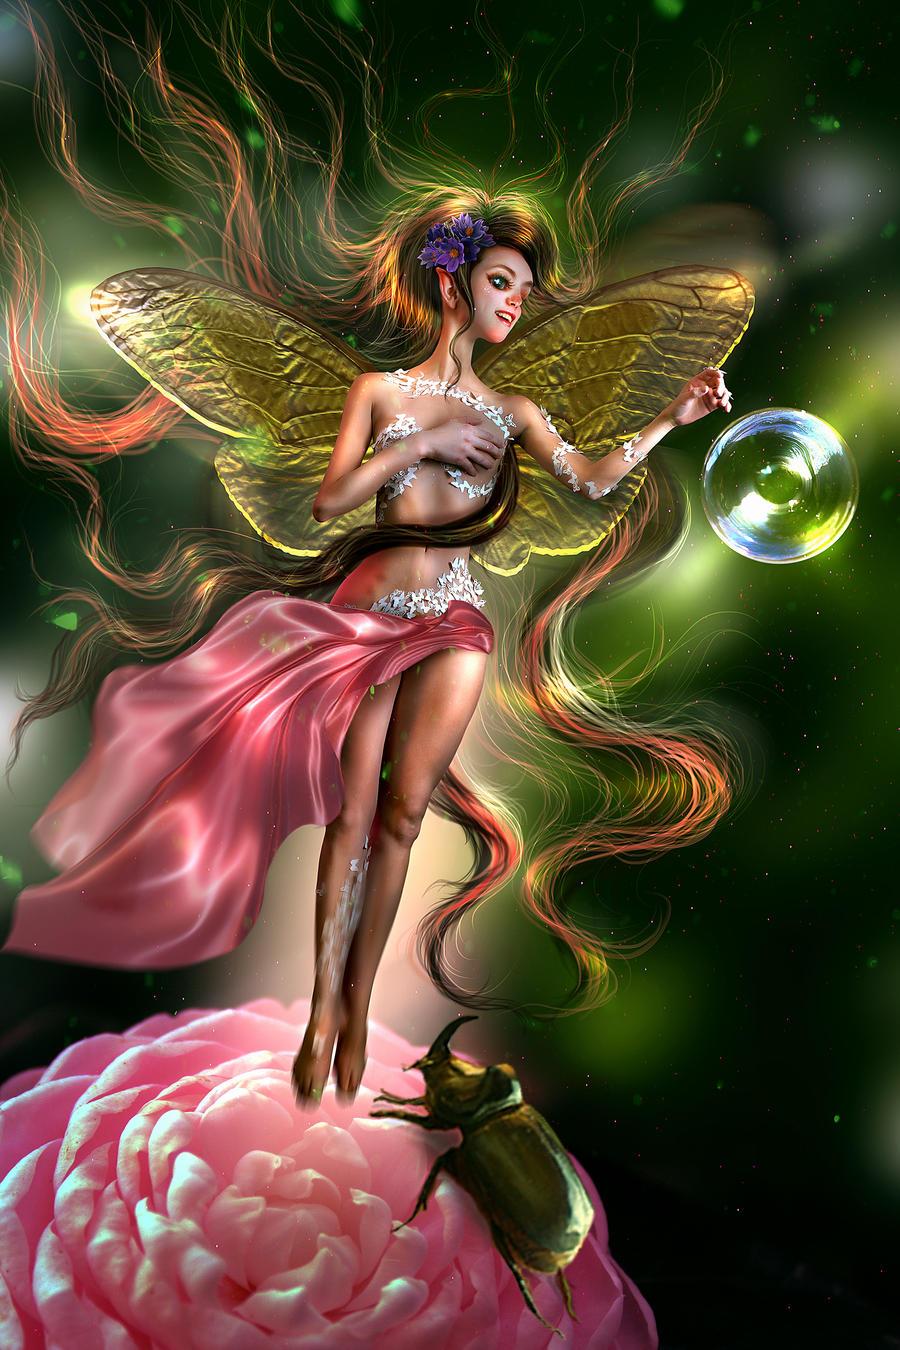 Nessinia the Fairy - NEW WORK!